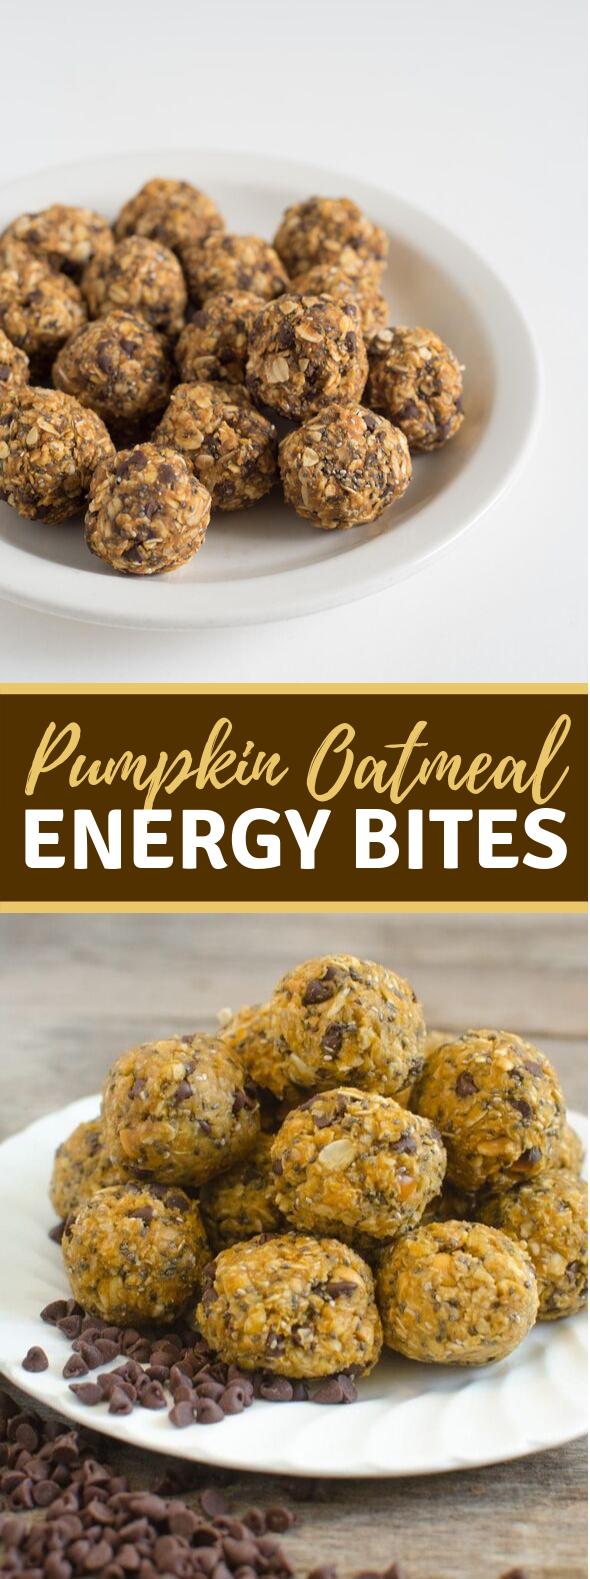 No-Bake Pumpkin Oatmeal Energy Balls #healthydiet #healthysnack